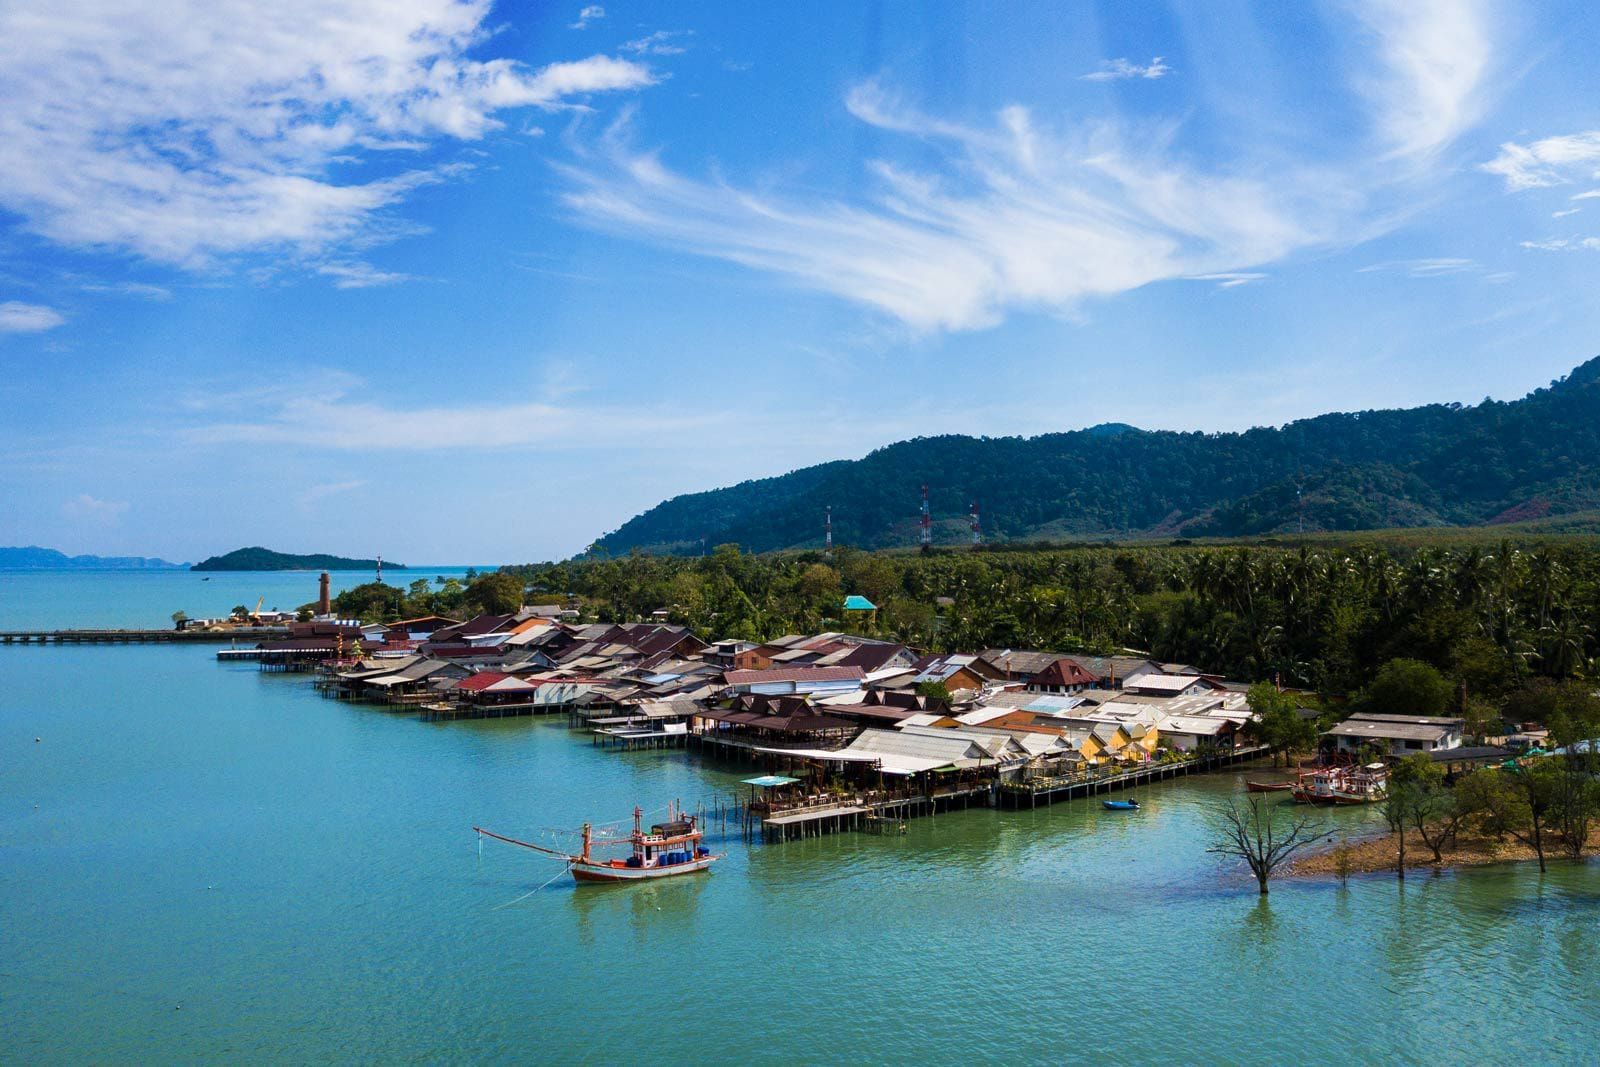 Koh Lanta Old Town Aearial